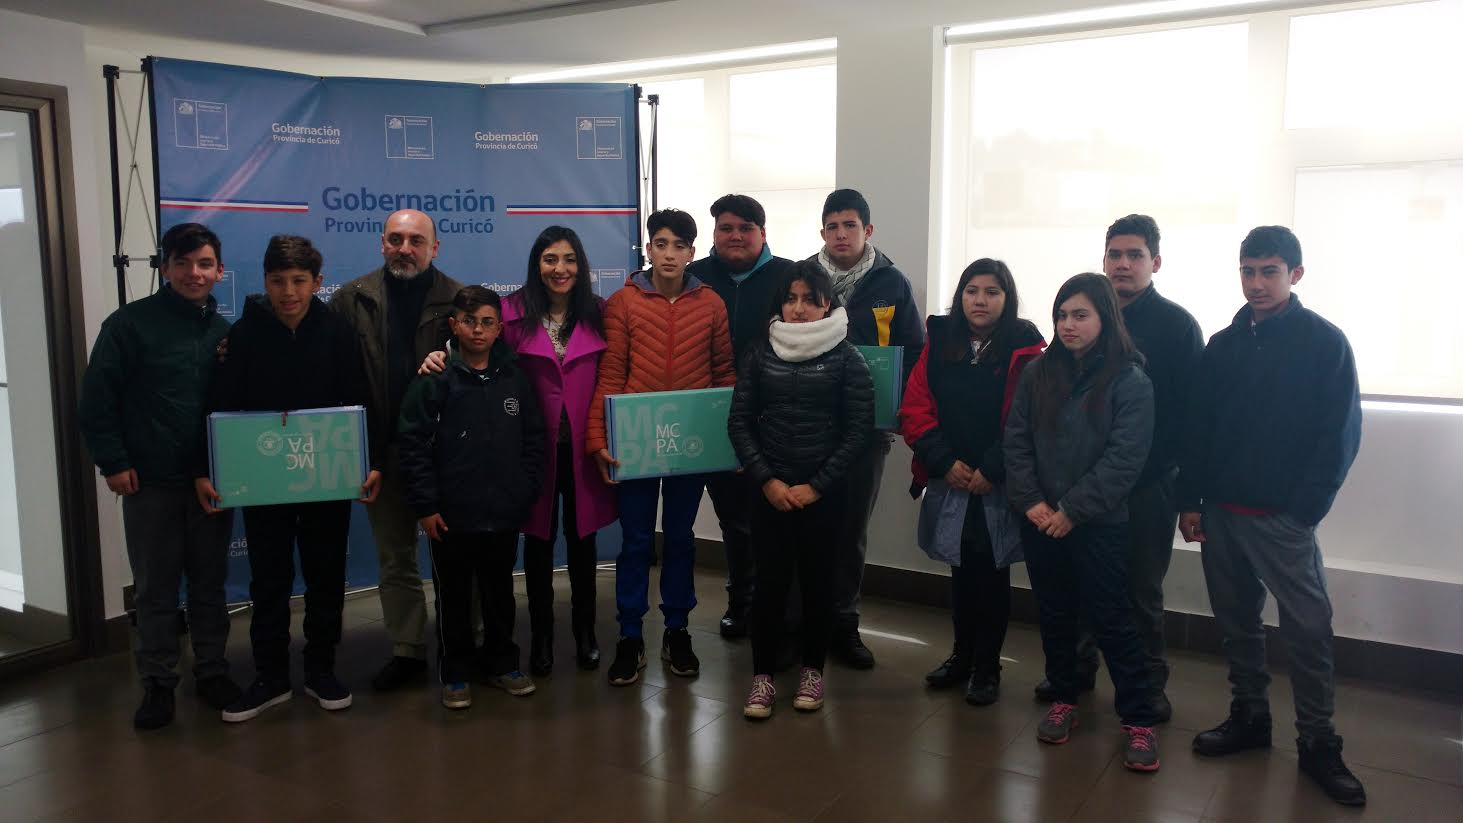 Gobierno a través de Junaeb entregó computadores a estudiantes de la Provincia de Curicó